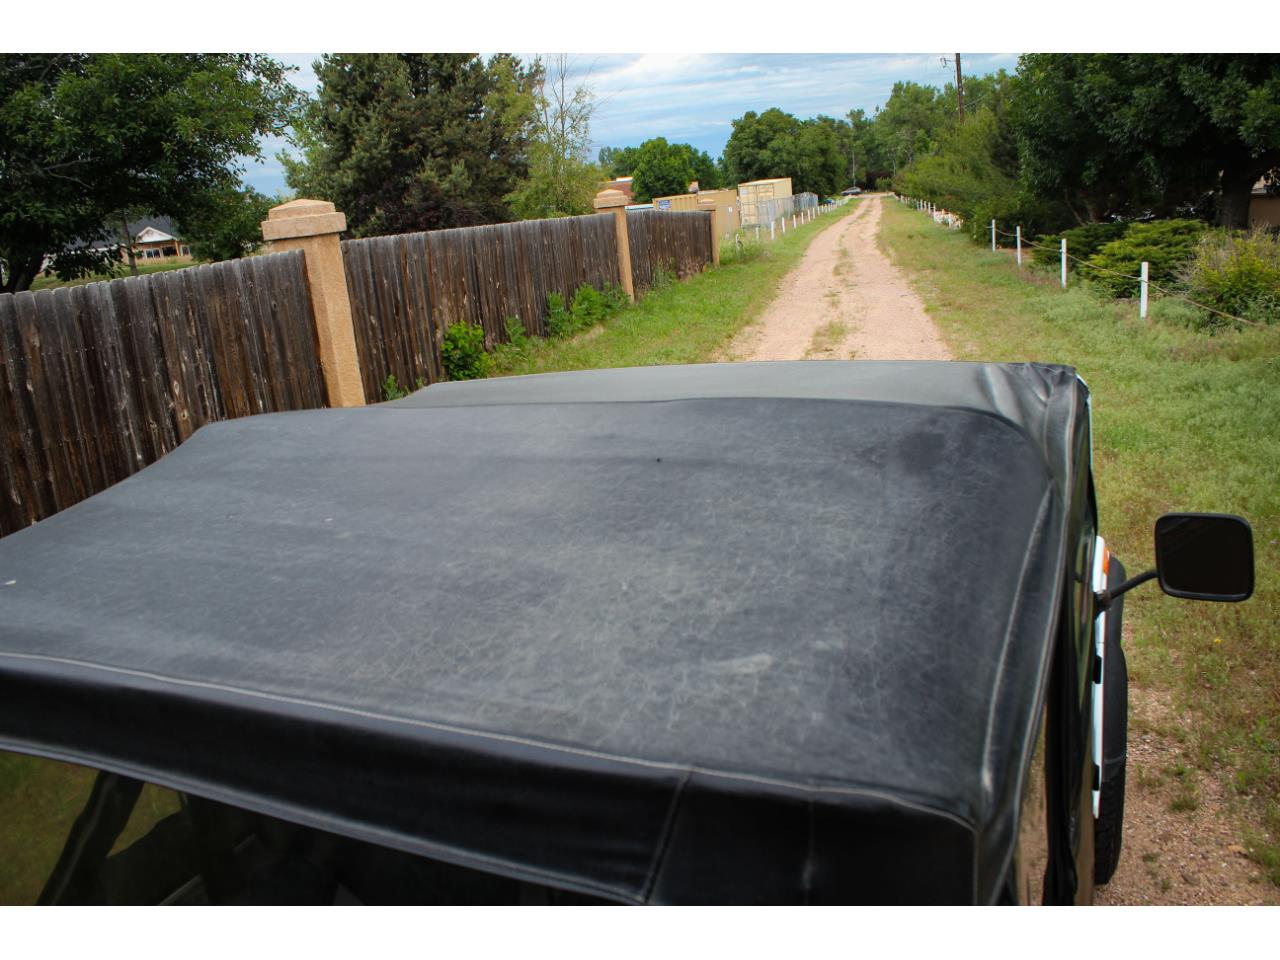 Large Picture of '74 Jeep CJ5 located in Greeley Colorado - $6,500.00 - QEBK